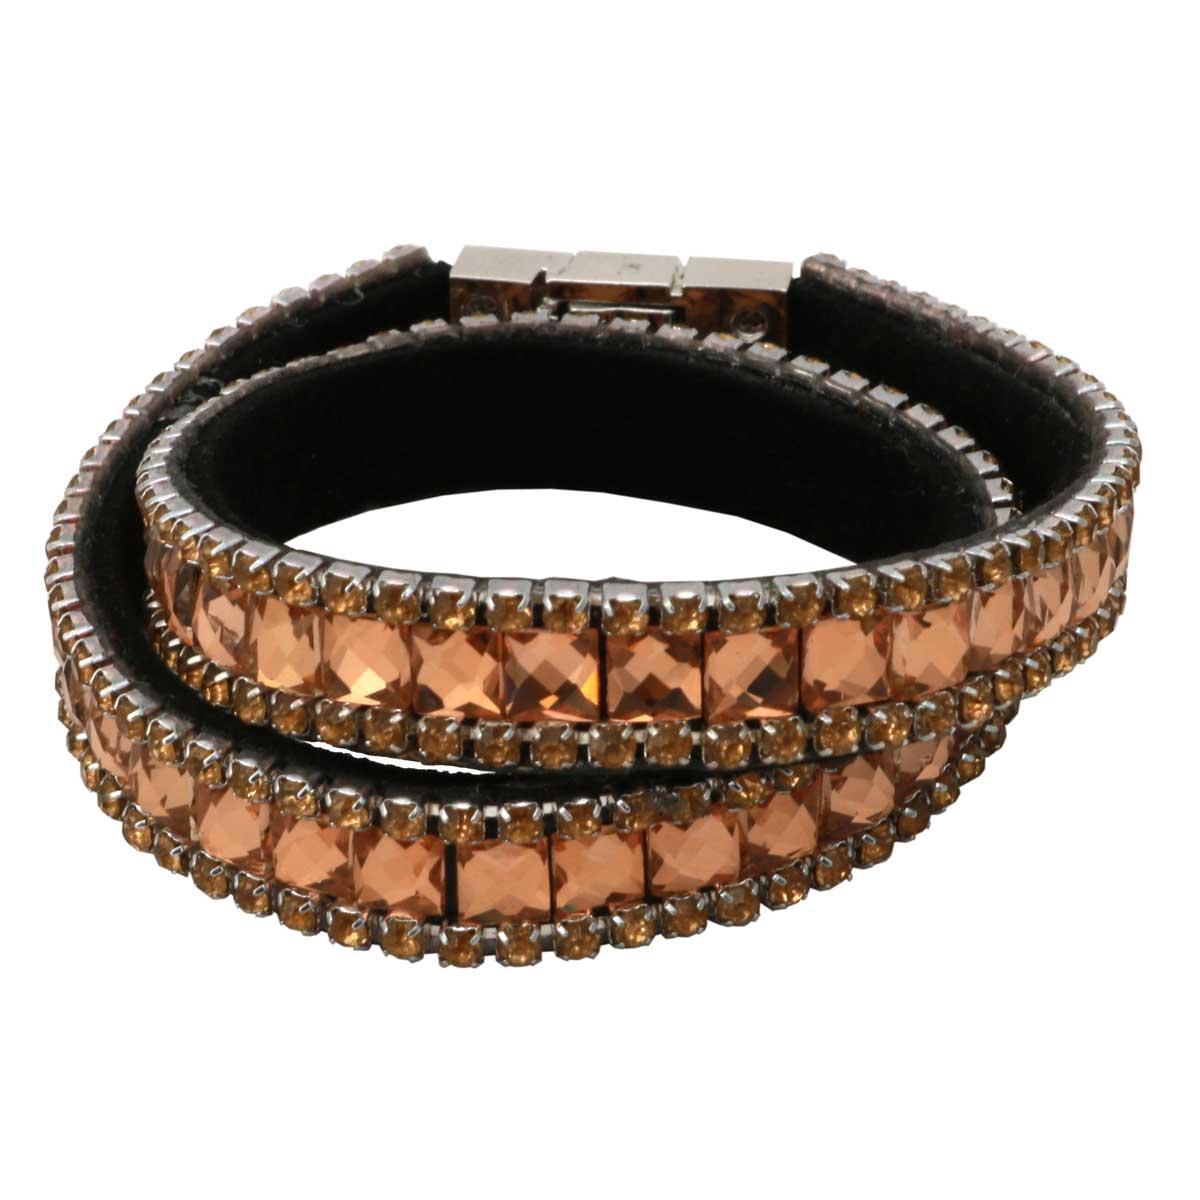 "Bronze Crystal Strap Wrap Bracelet 14.75""x.5"" *30sp"